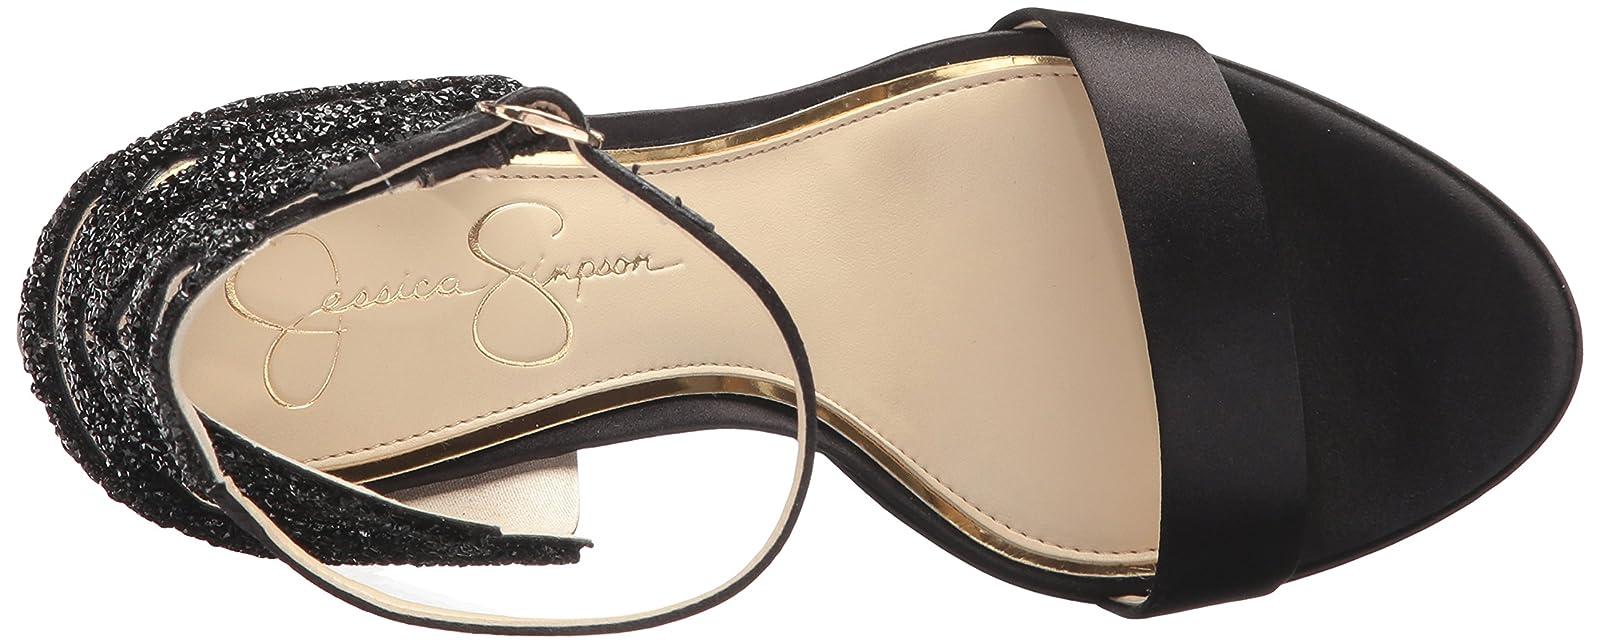 Jessica Simpson Women's BAYVINN Heeled Sandal US - 8